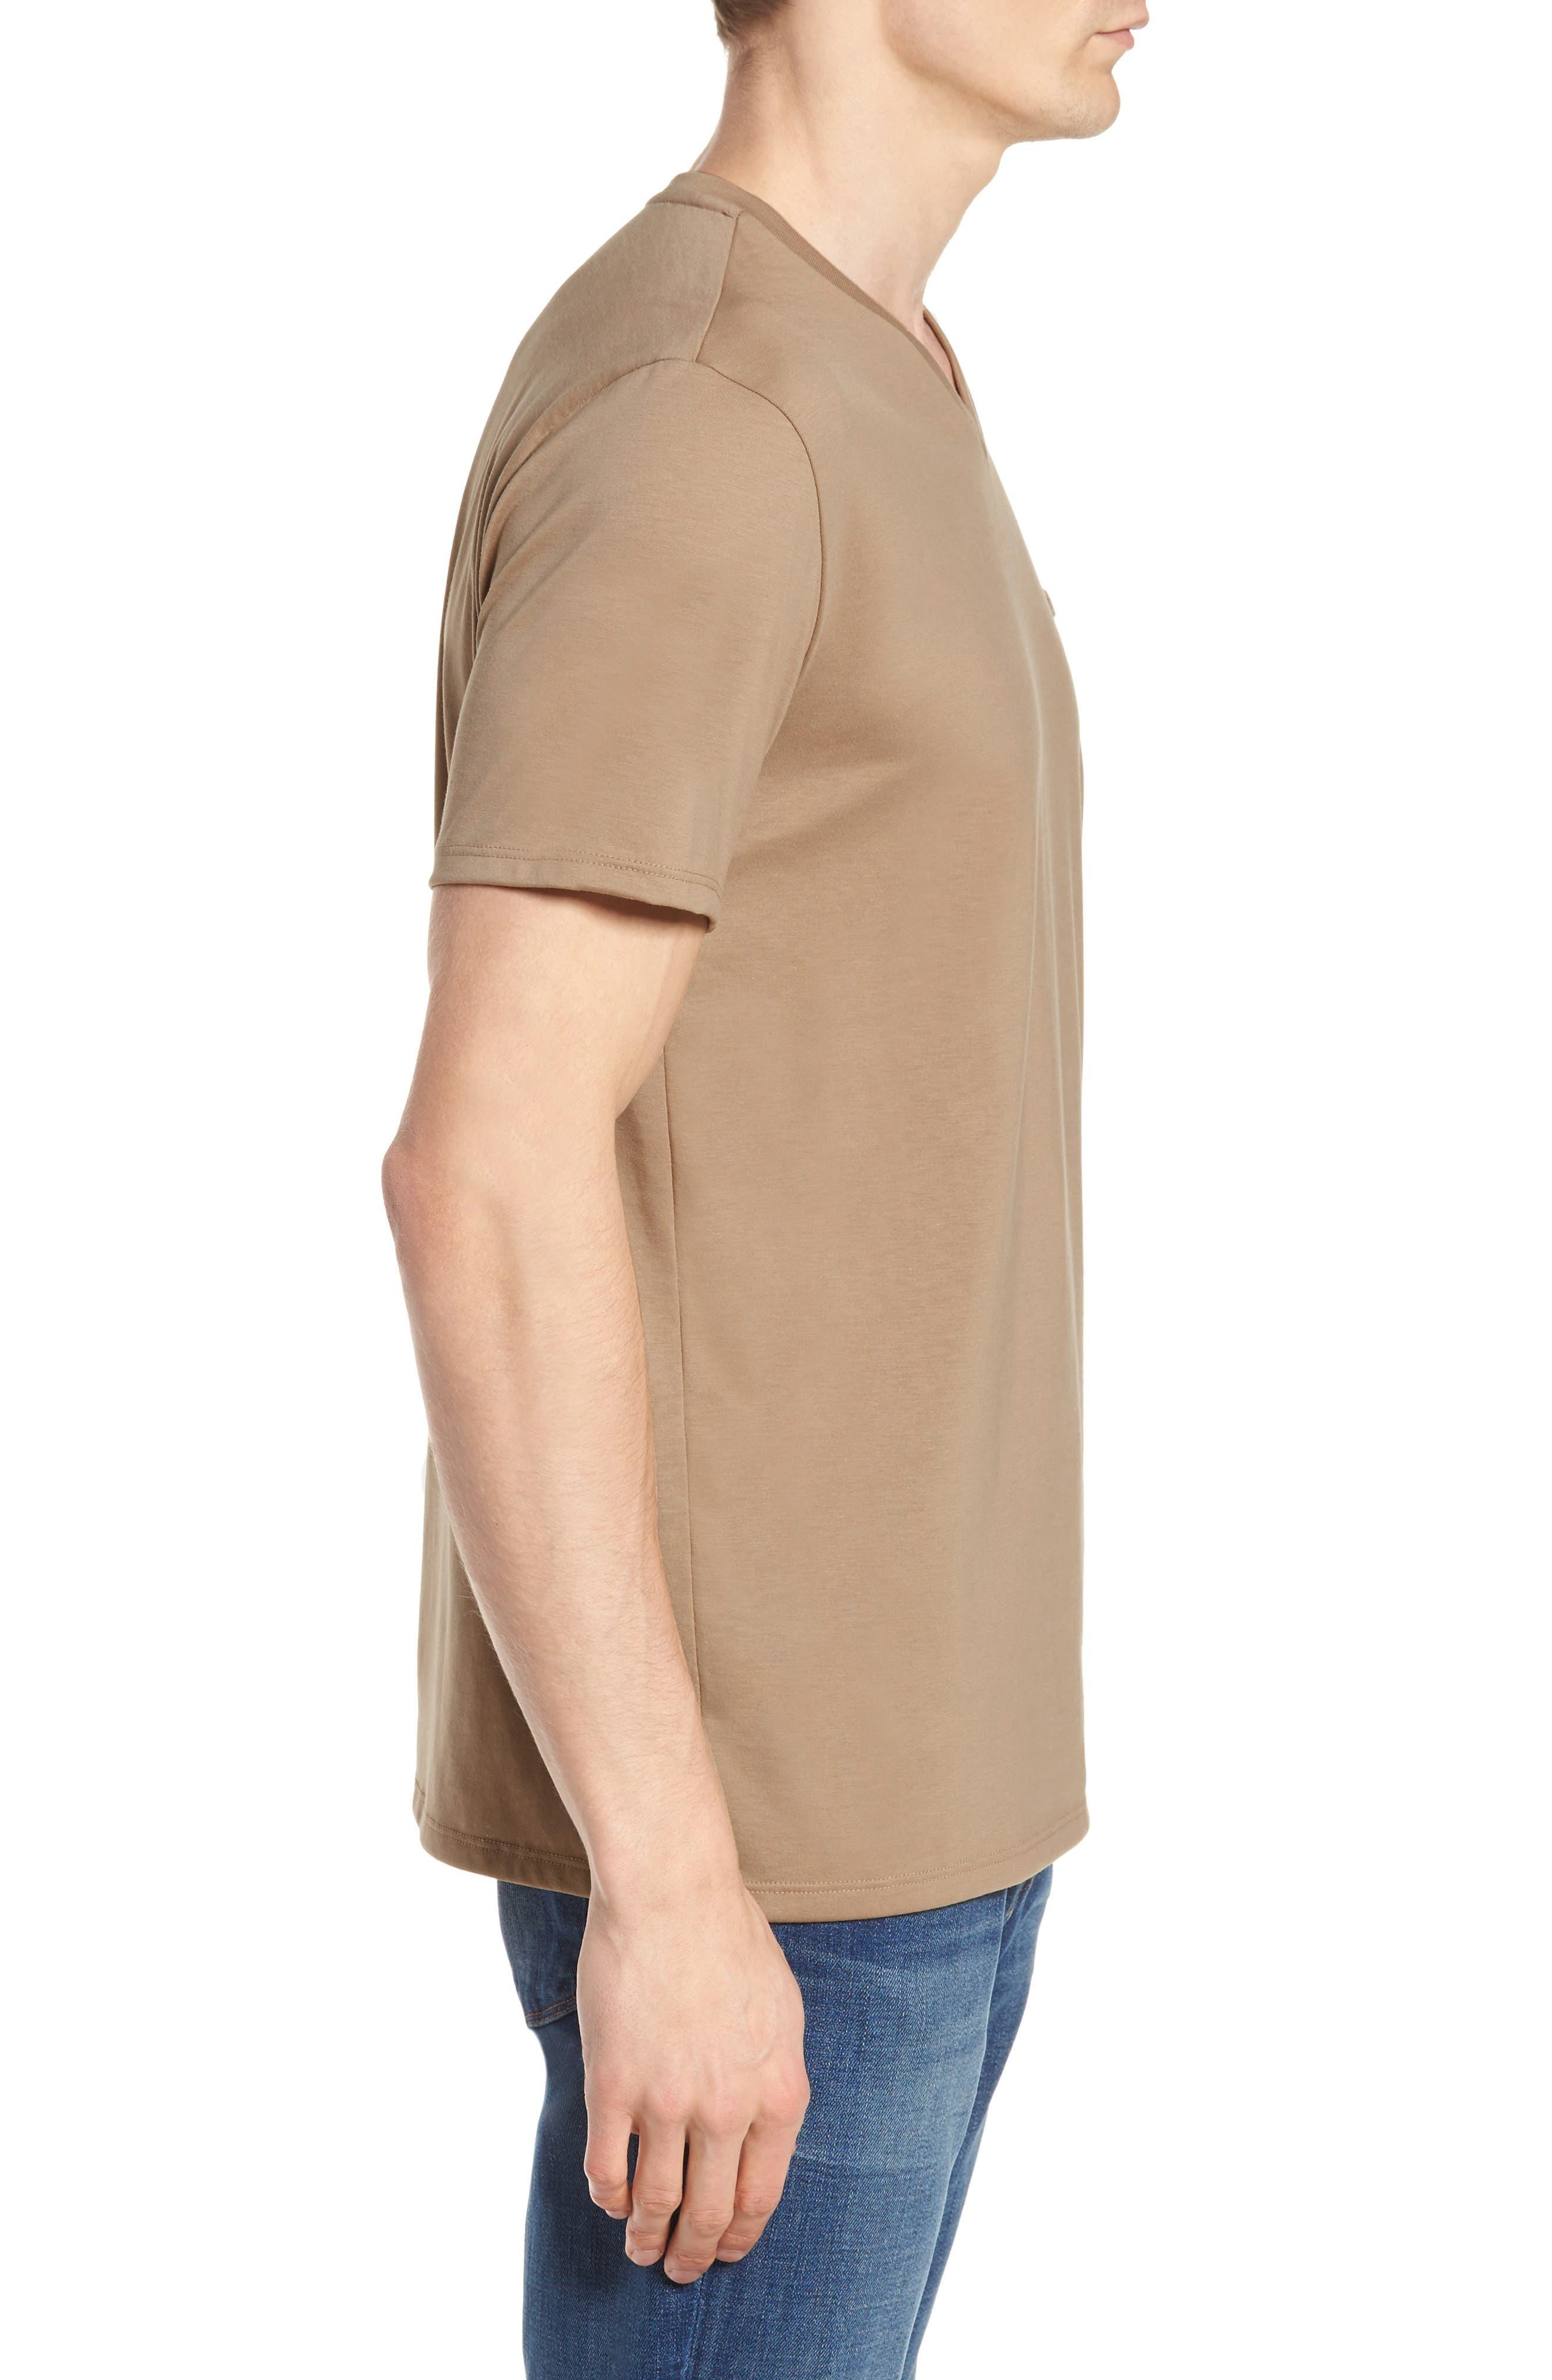 Pima Cotton T-Shirt,                             Alternate thumbnail 3, color,                             KRAFT BEIGE